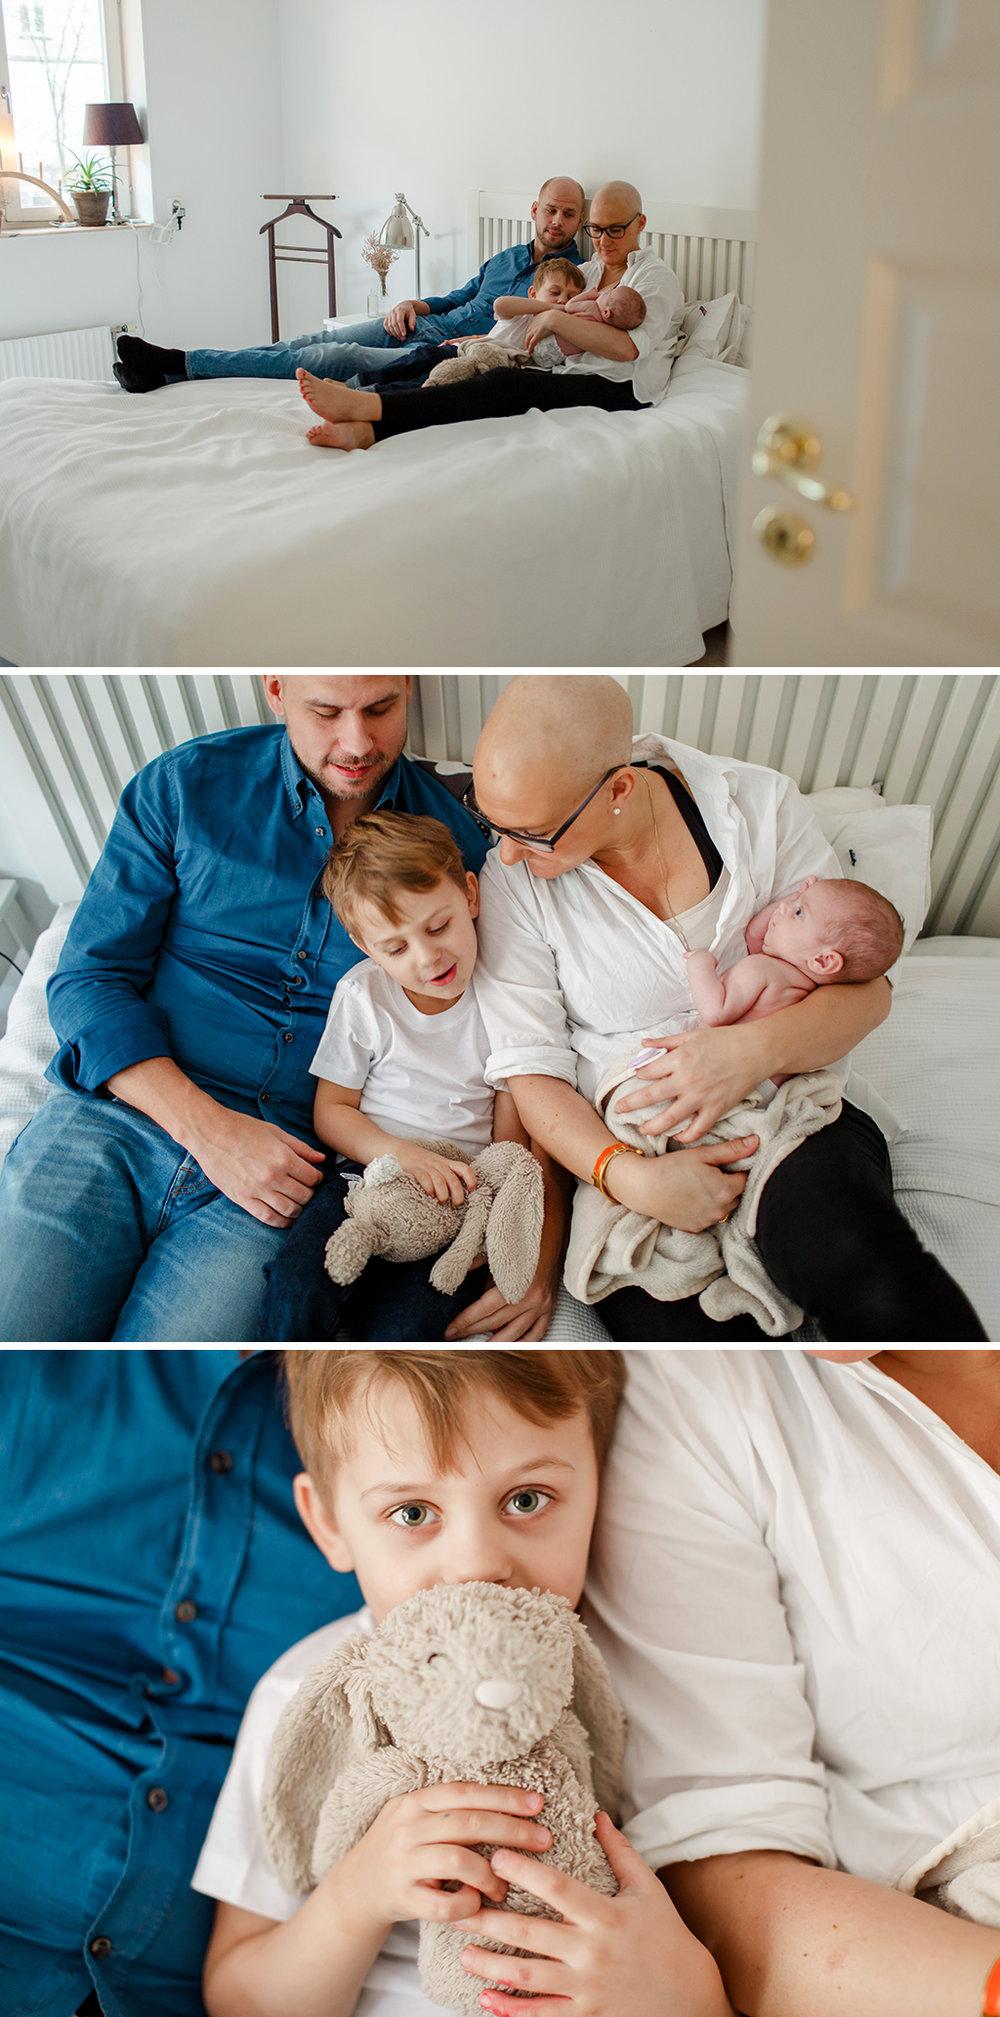 Lifestyle-nyfoddfotografering_newbornphotography_familjefotograf_Stockholm_4.jpg